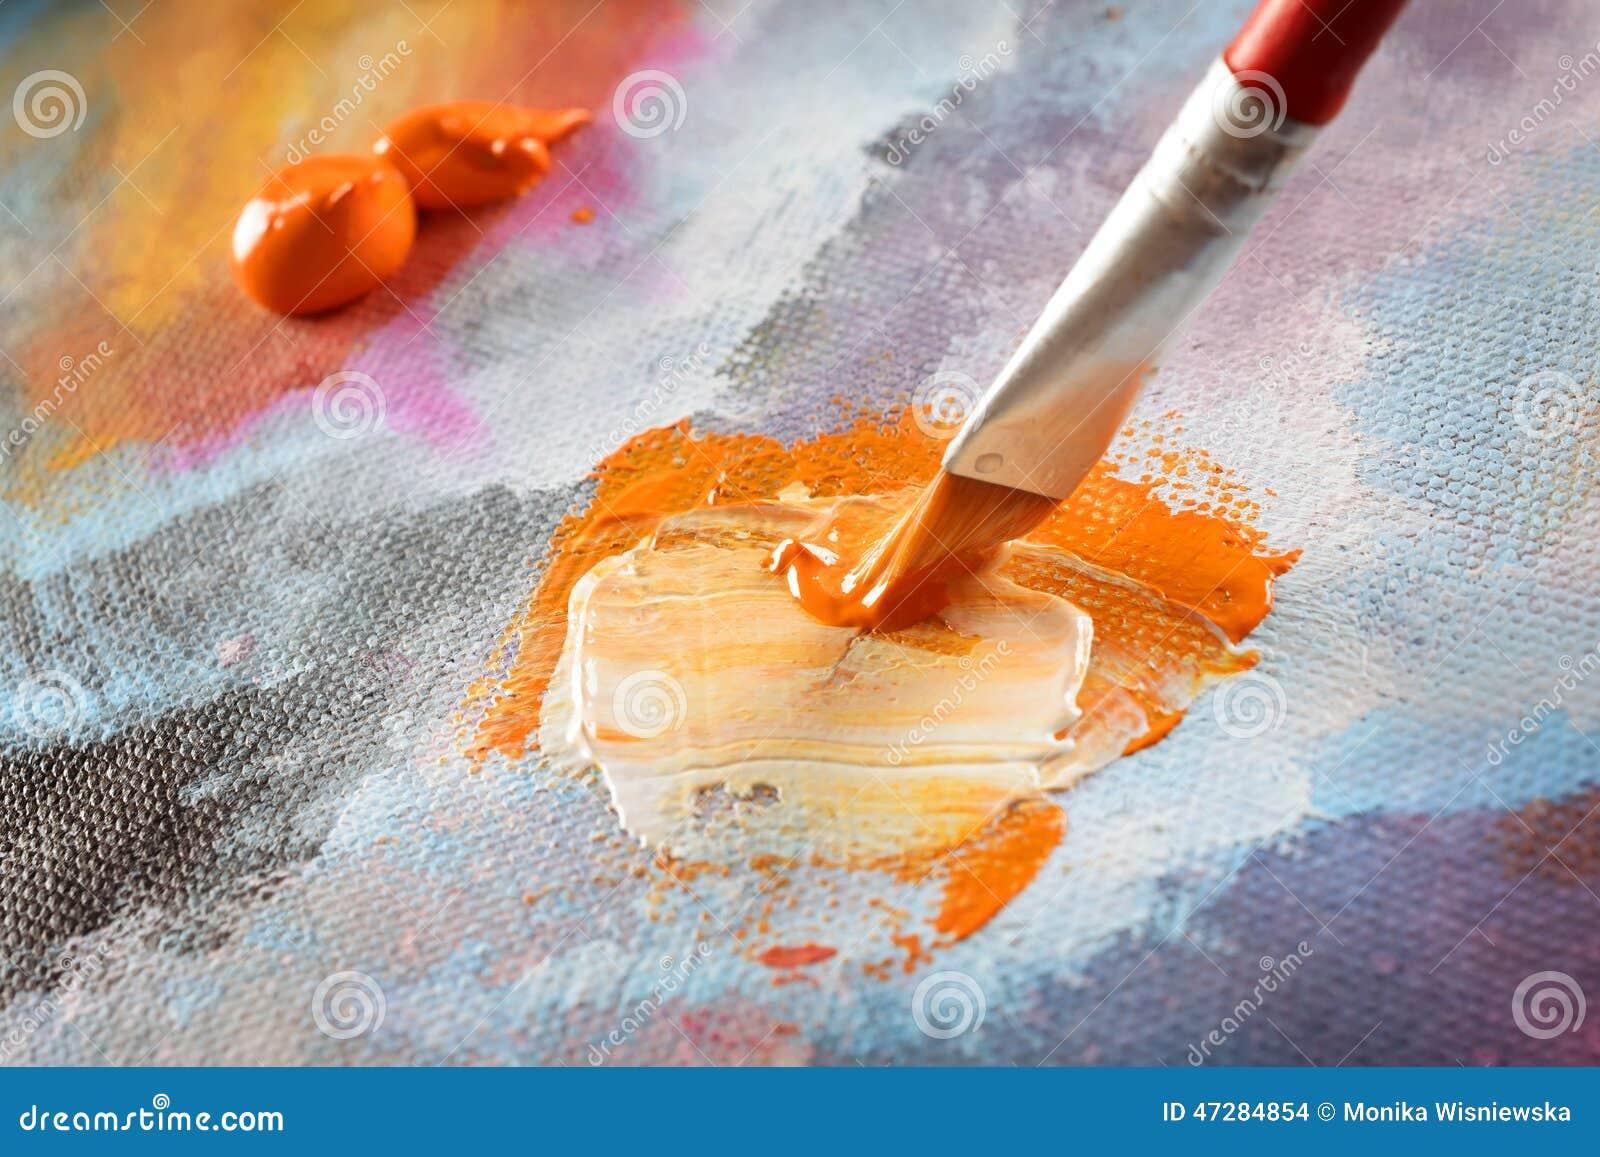 Artist hand painting